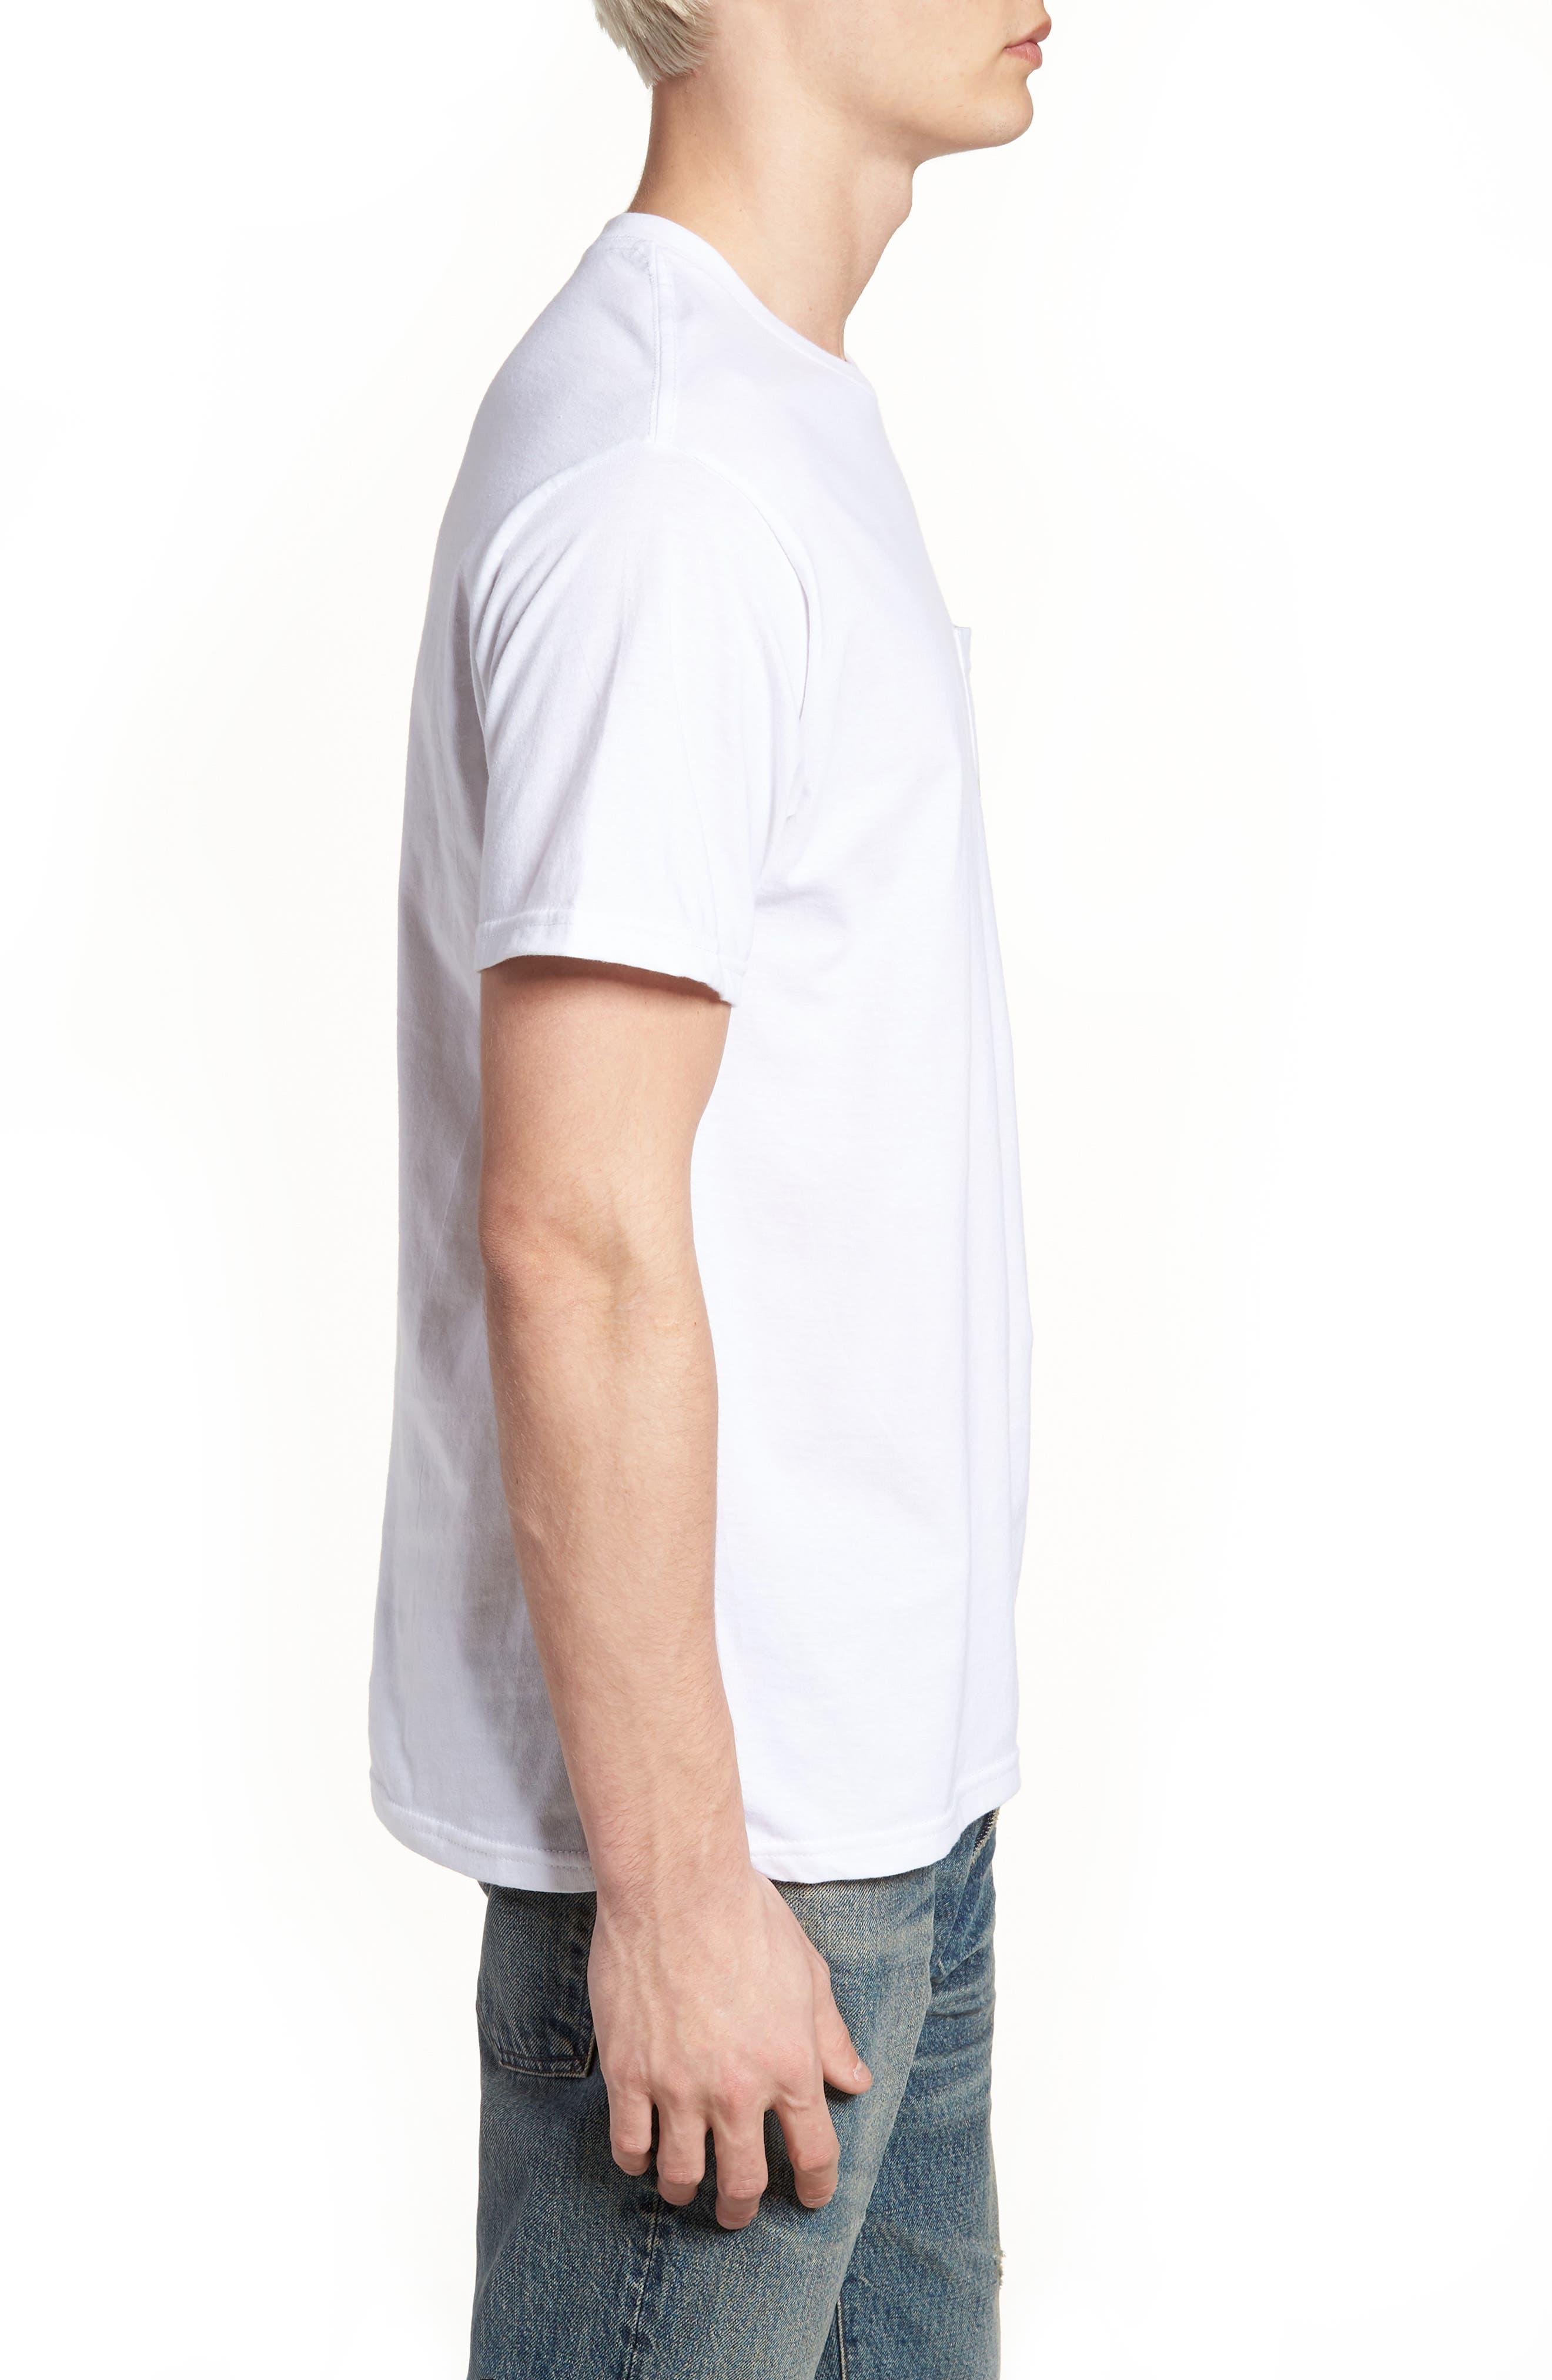 Shinanigans Graphic T-Shirt,                             Alternate thumbnail 3, color,                             White